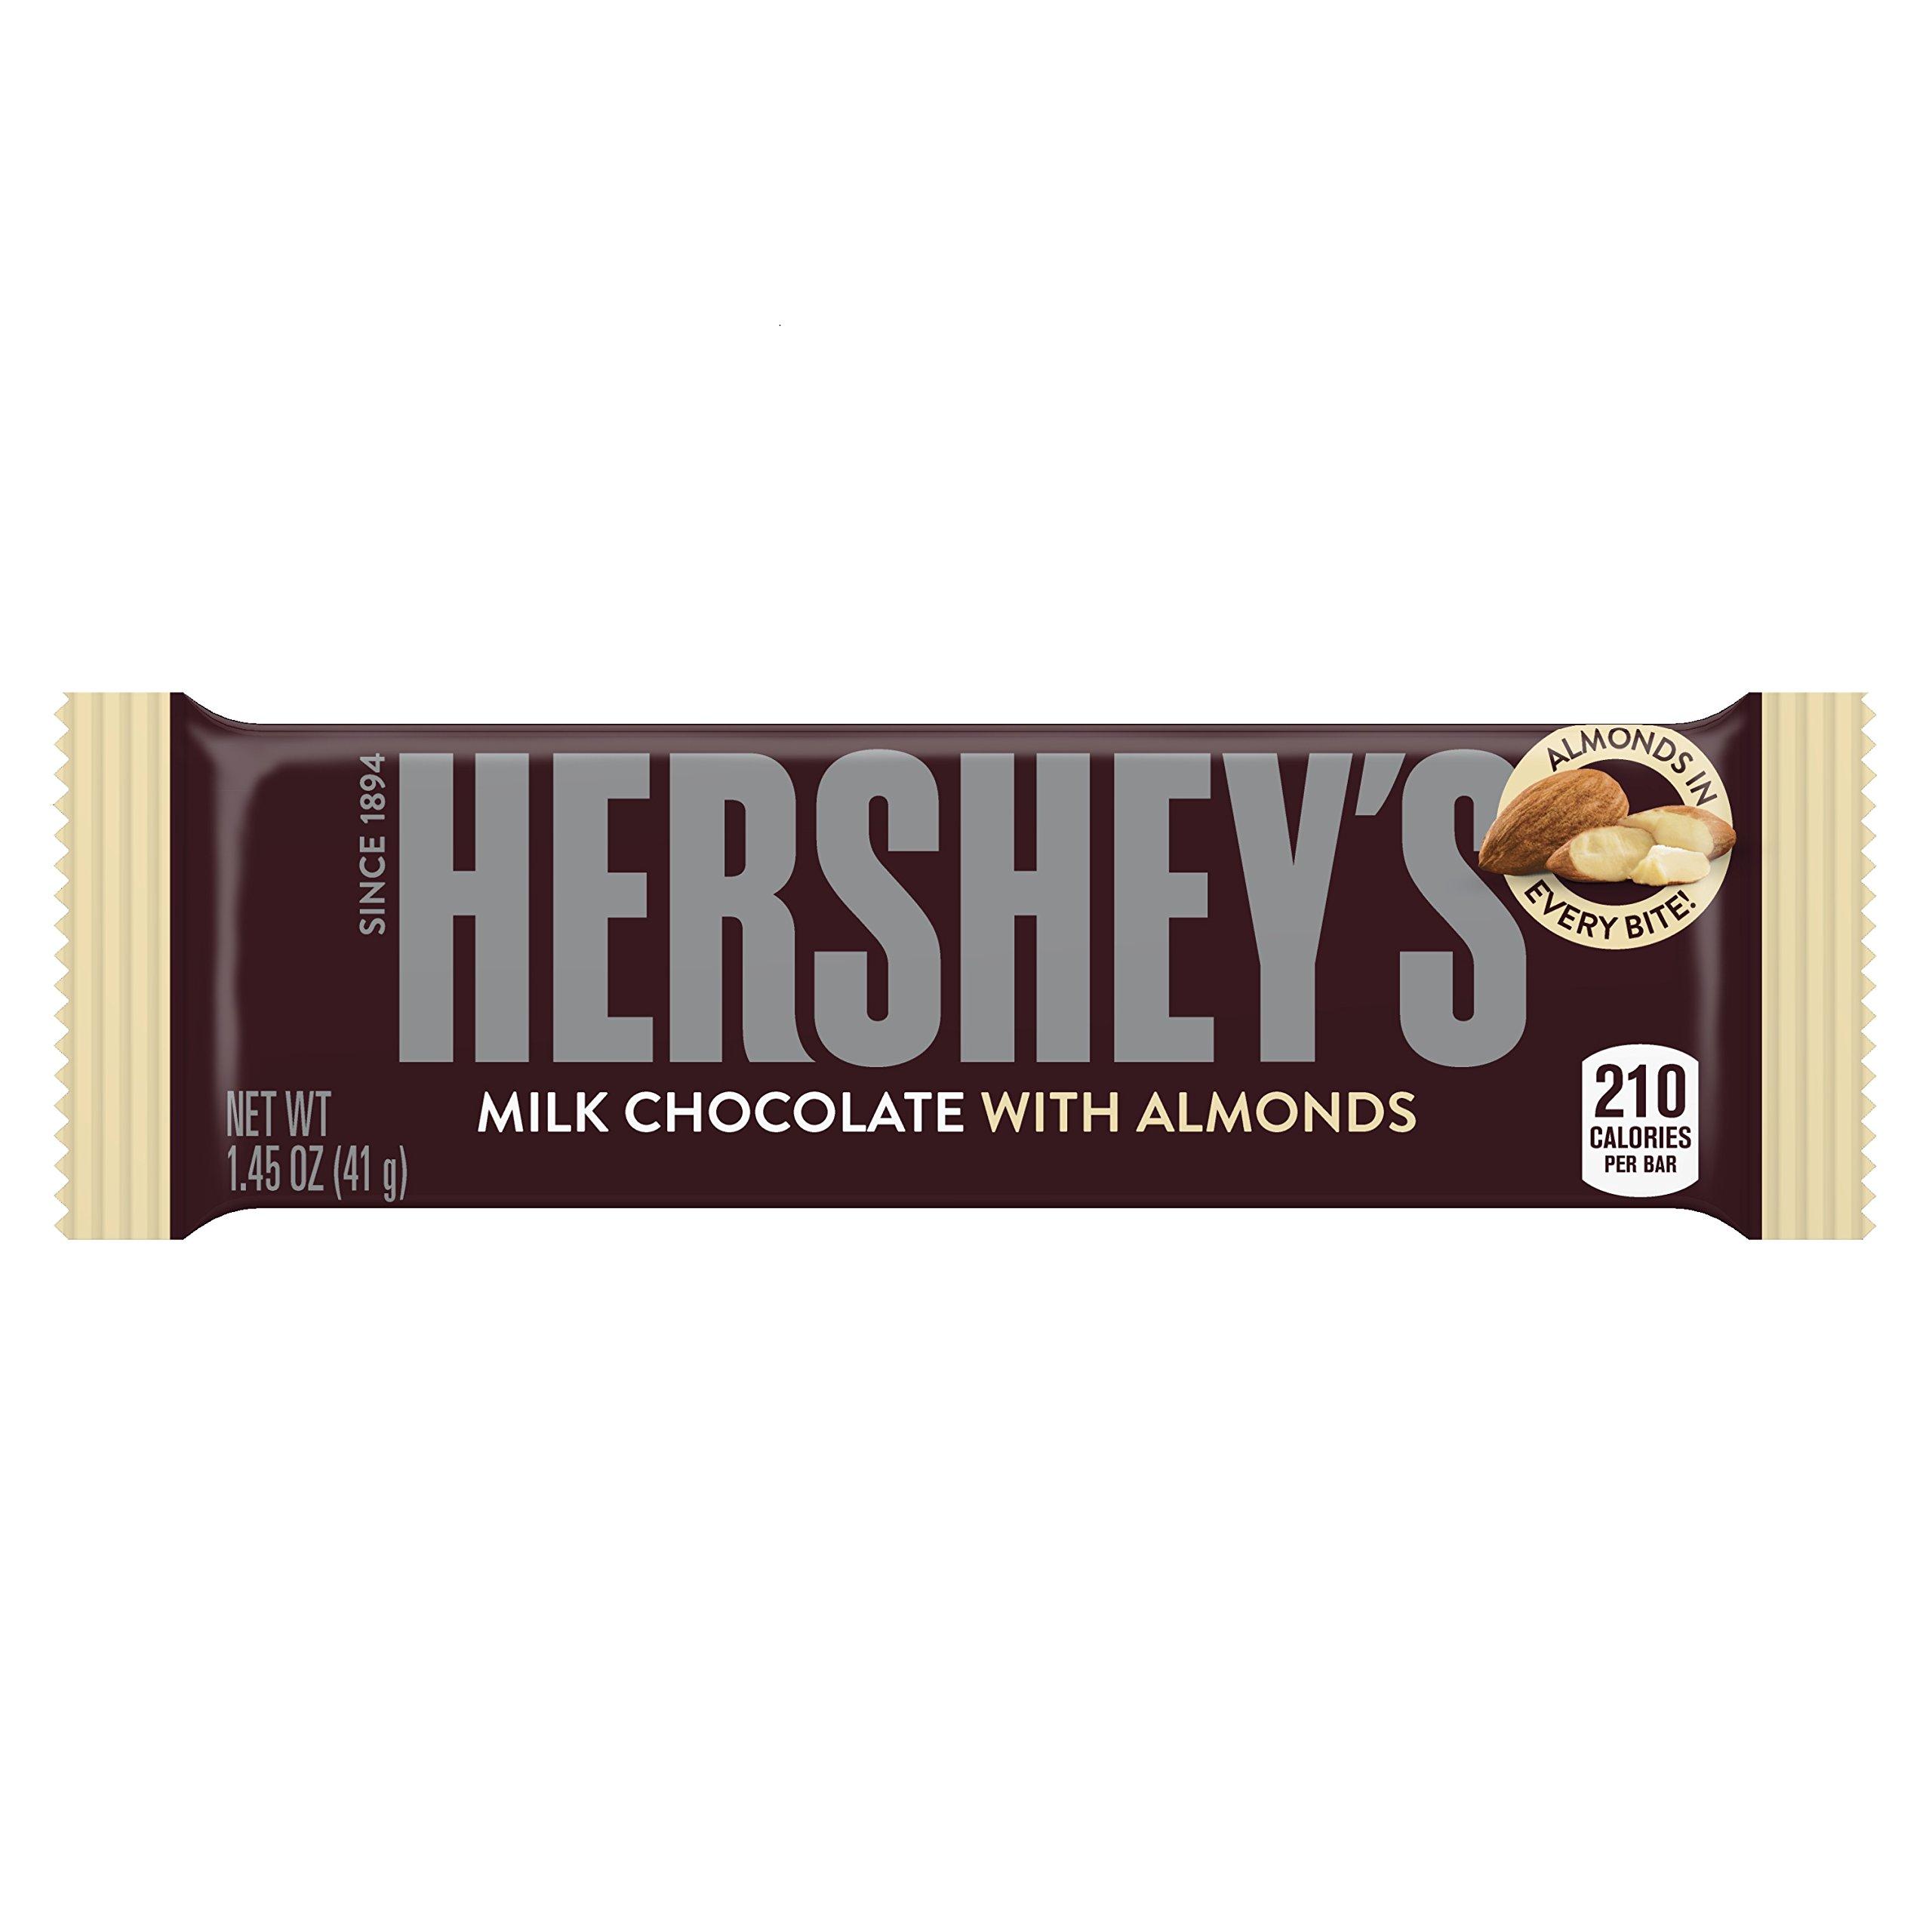 HERSHEY'S Chocolate Bar with Almonds, Milk Chocolate Candy Bar with Almonds, 1.45 Ounce Bar (Pack of 36)